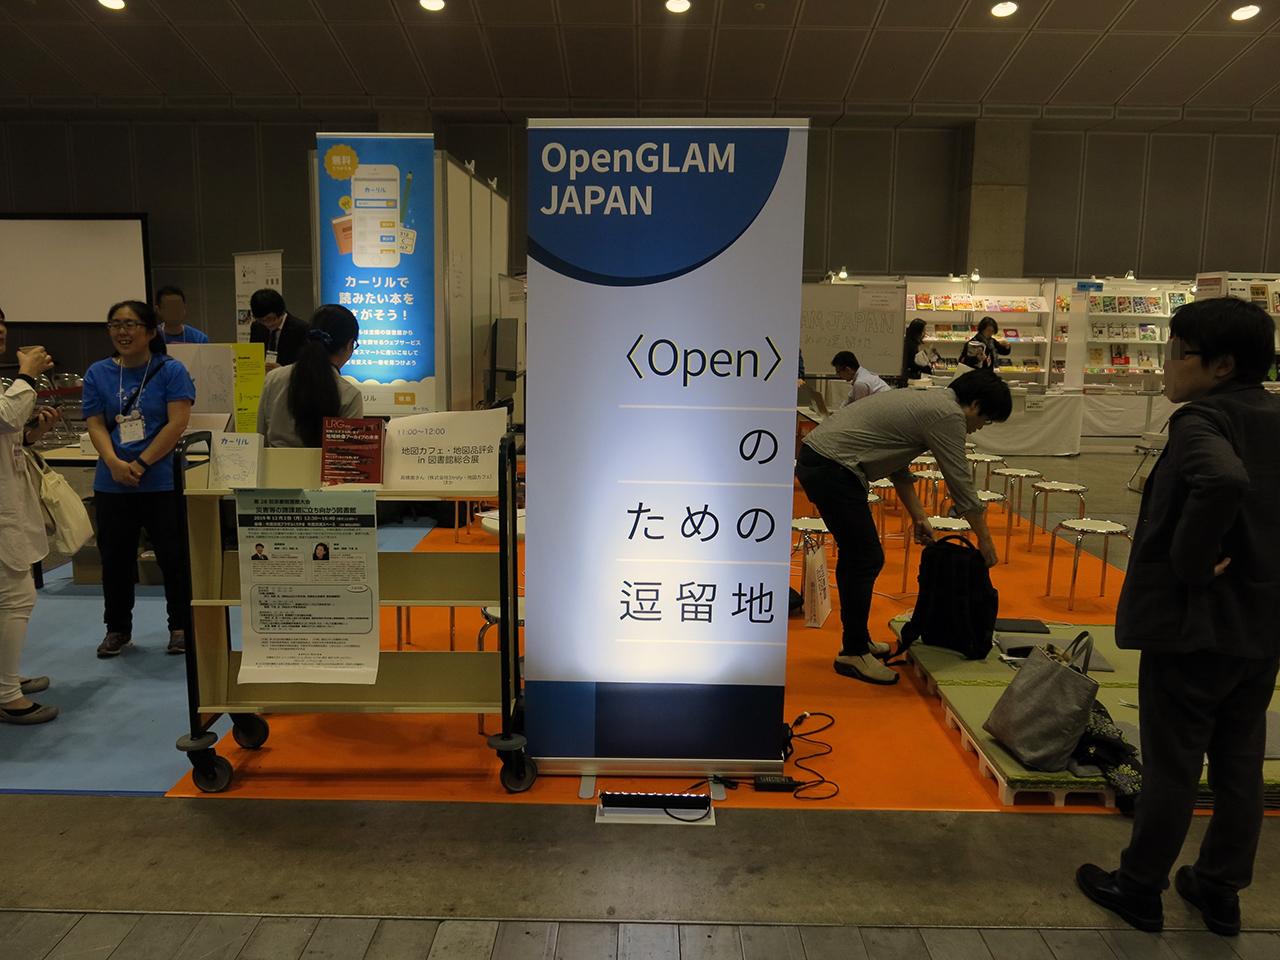 OpenGLAM Japan